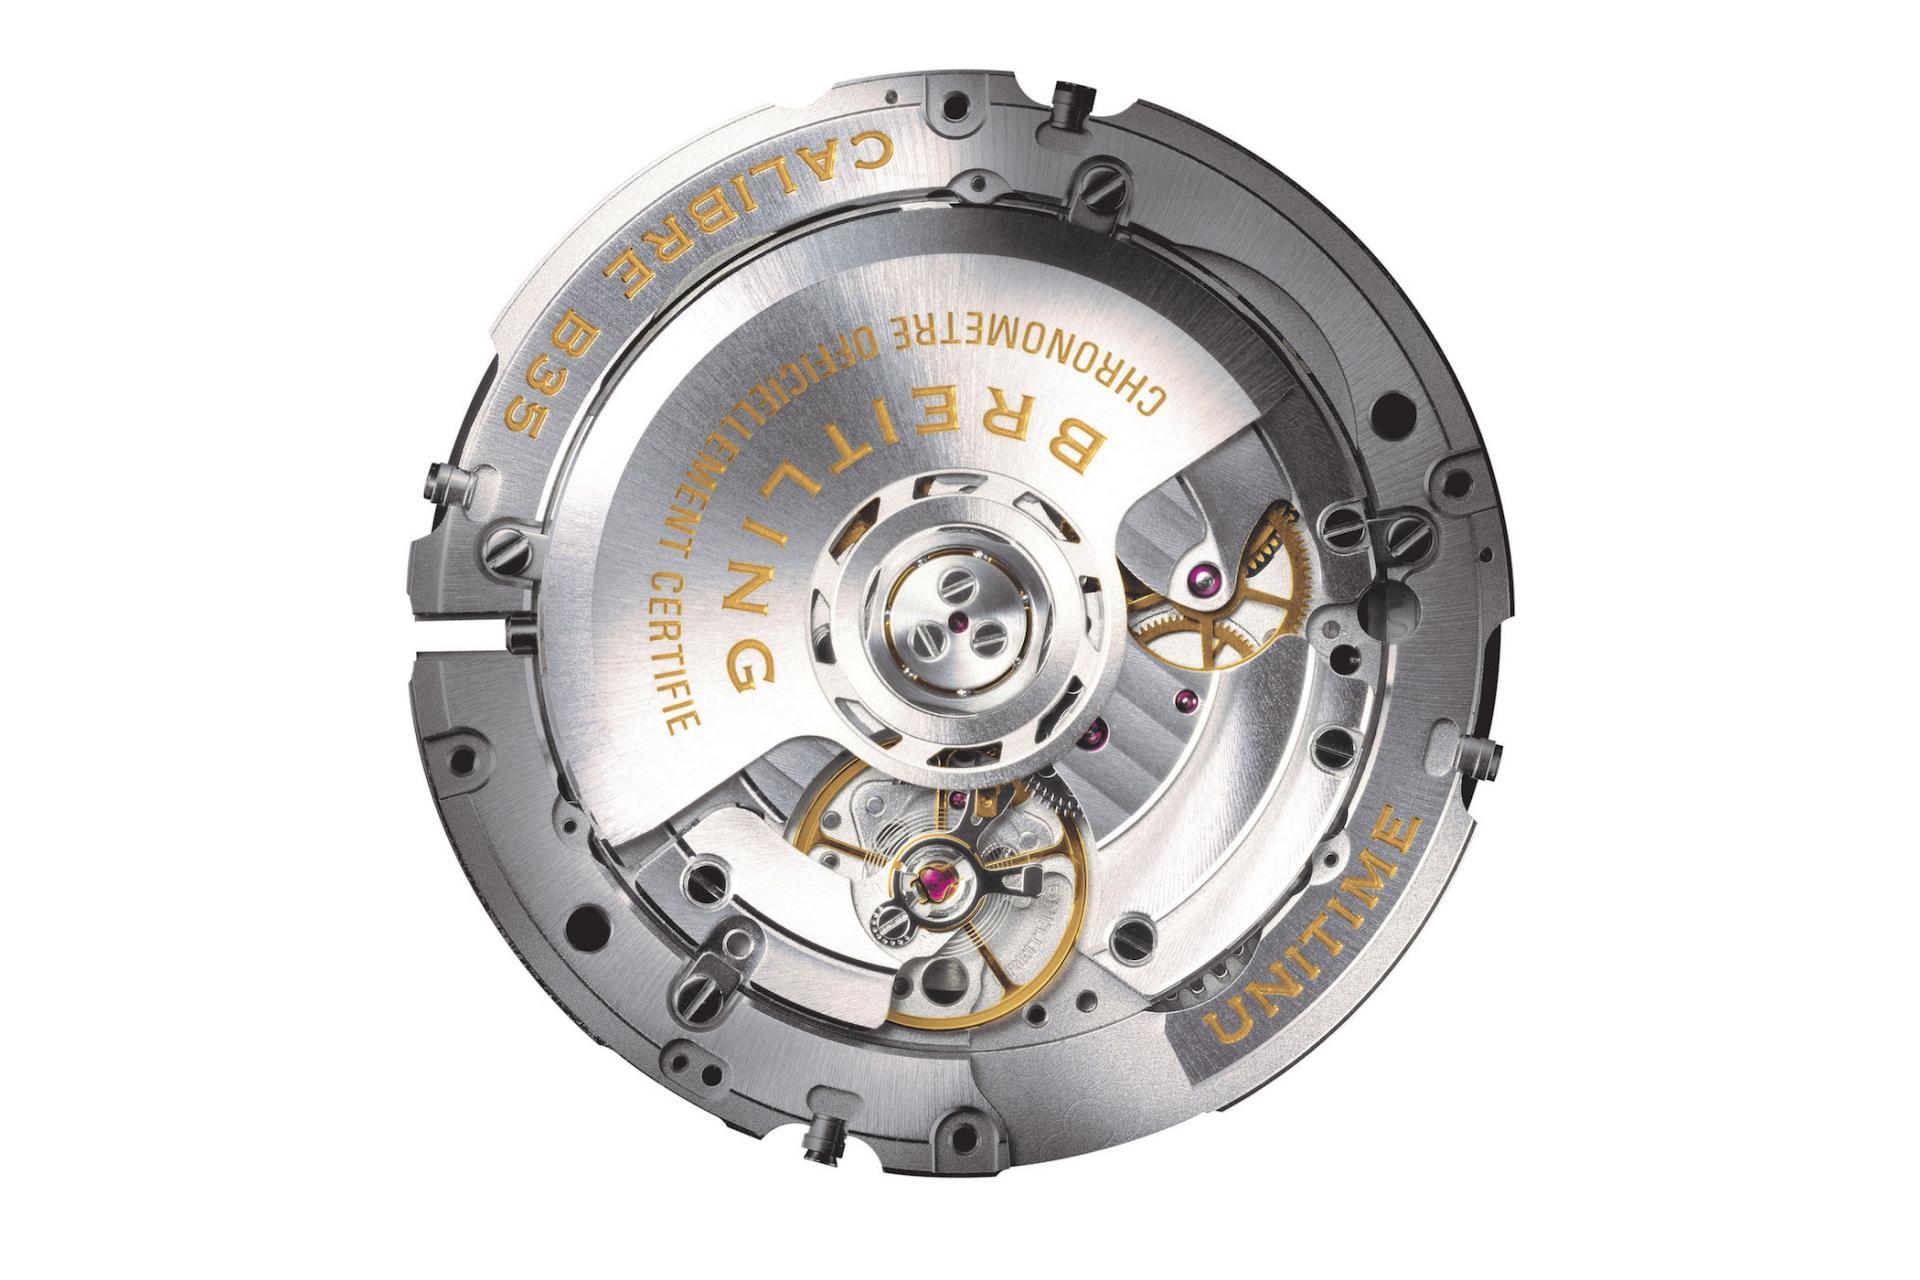 Naziv: Breitling_Manufacture_Caliber_B35-unitime.jpg, pregleda: 204, veličina: 206,3 KB